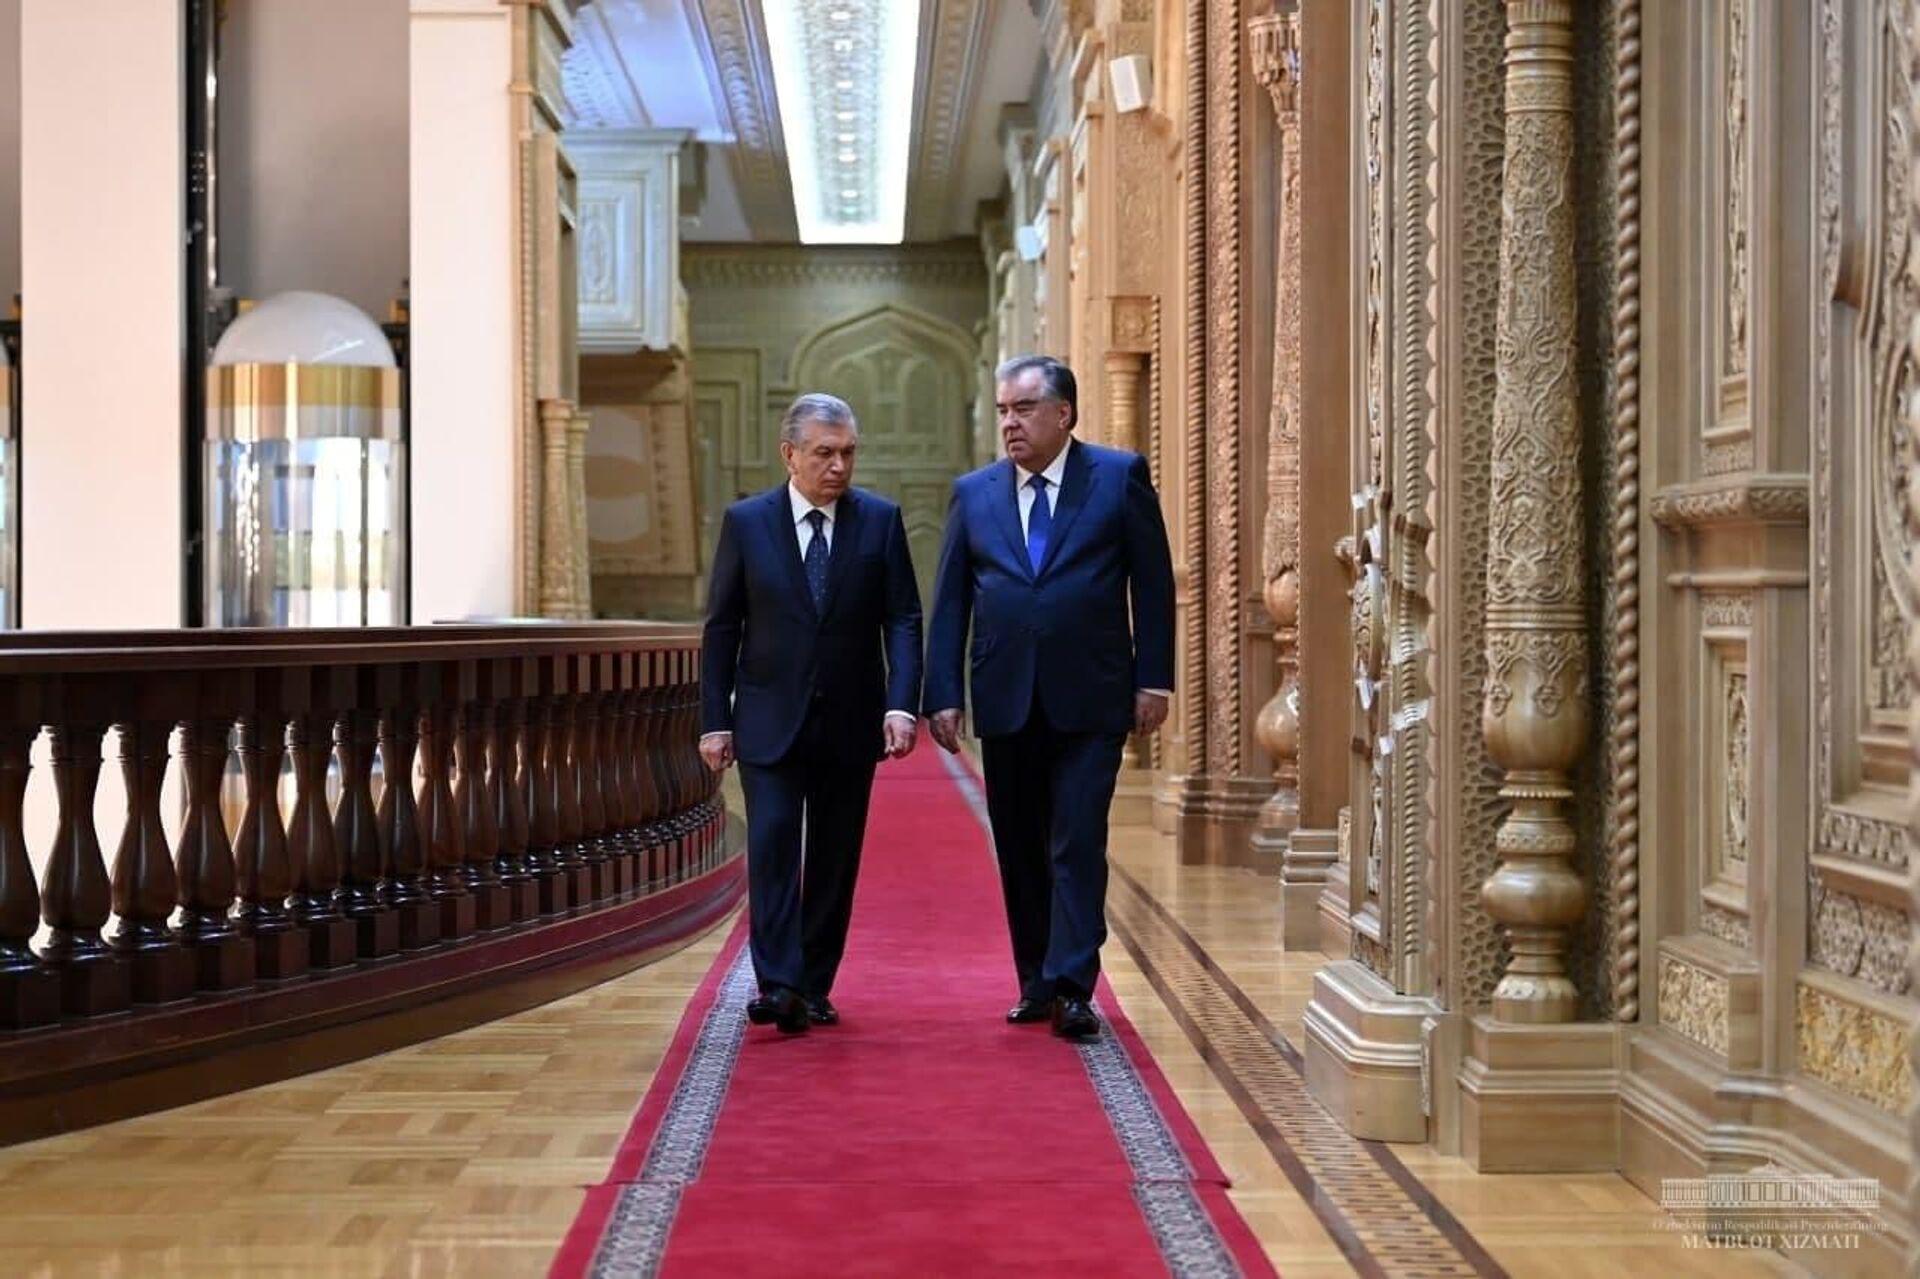 Президент Узбекистана Шавкат Мирзиеев и президент Таджикистана Эмомали Рахмон - Sputnik Таджикистан, 1920, 16.09.2021